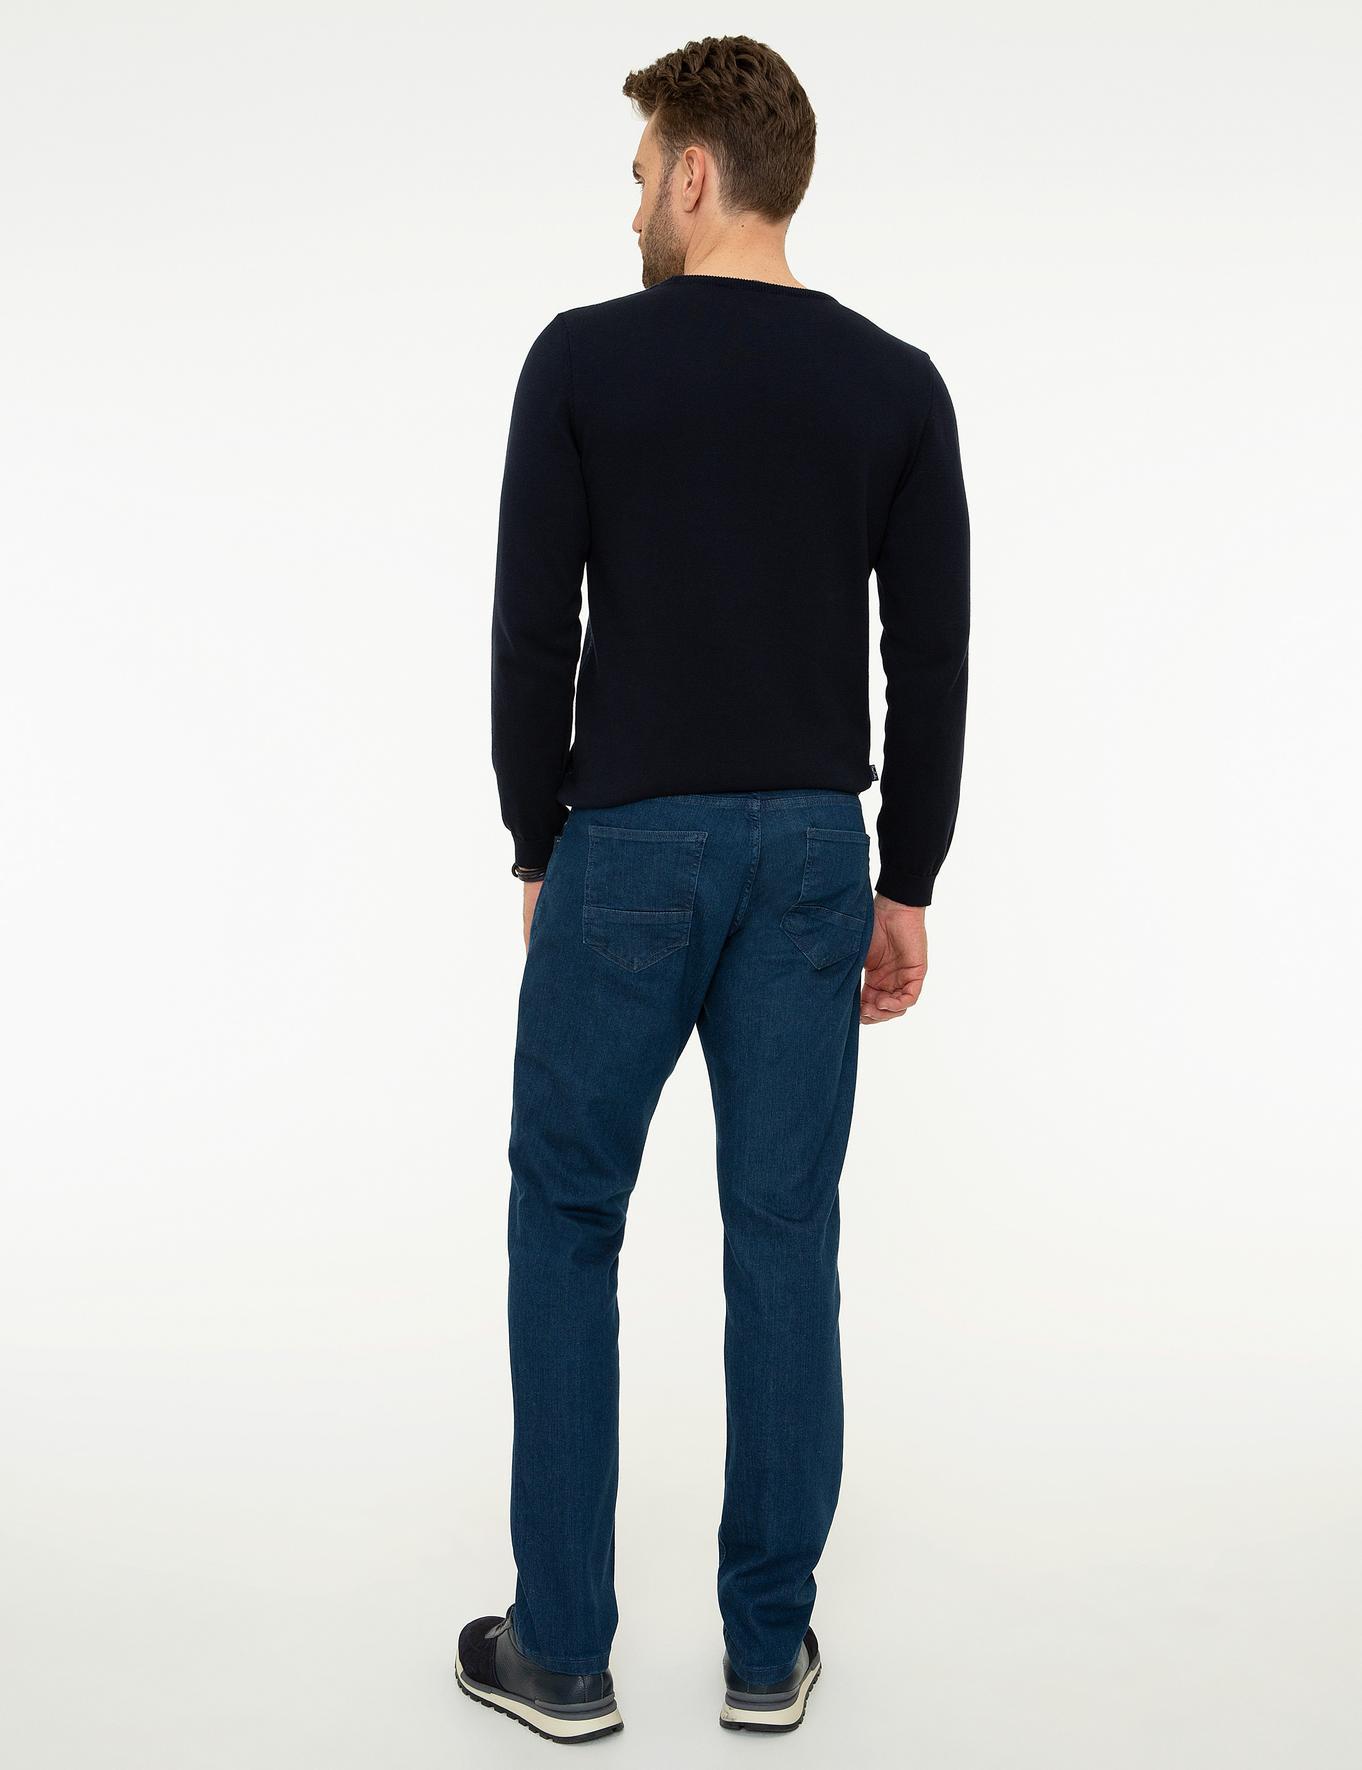 Koyu Mavi Slim Fit Denim Pantolon